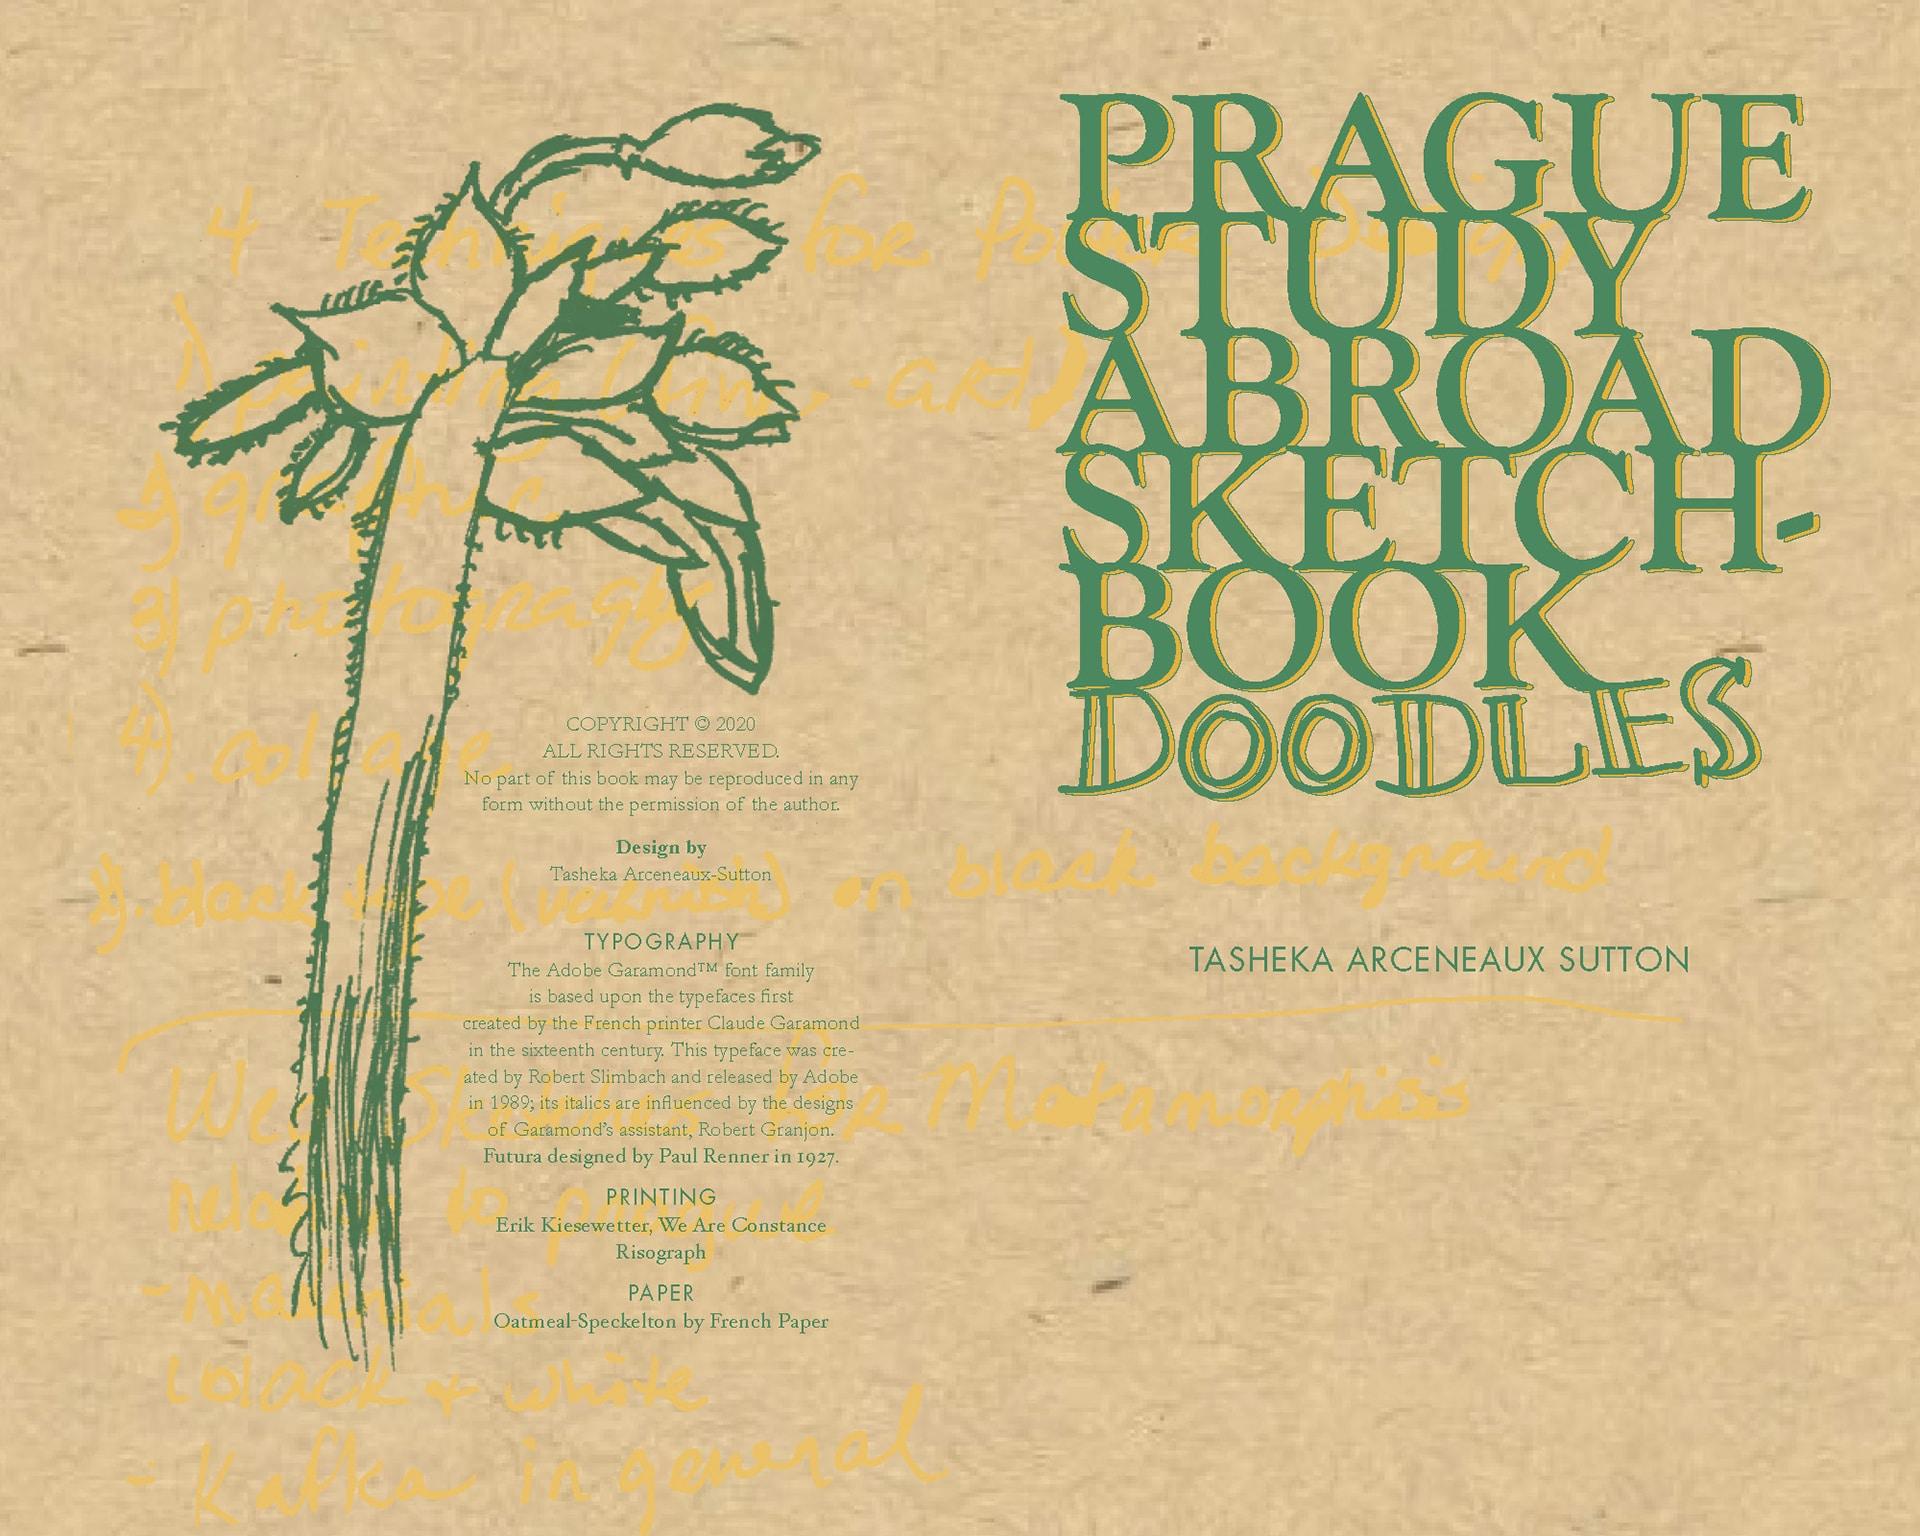 Prague Study Abroad Sketch Book Doodles, by Tasheka Arceneaux